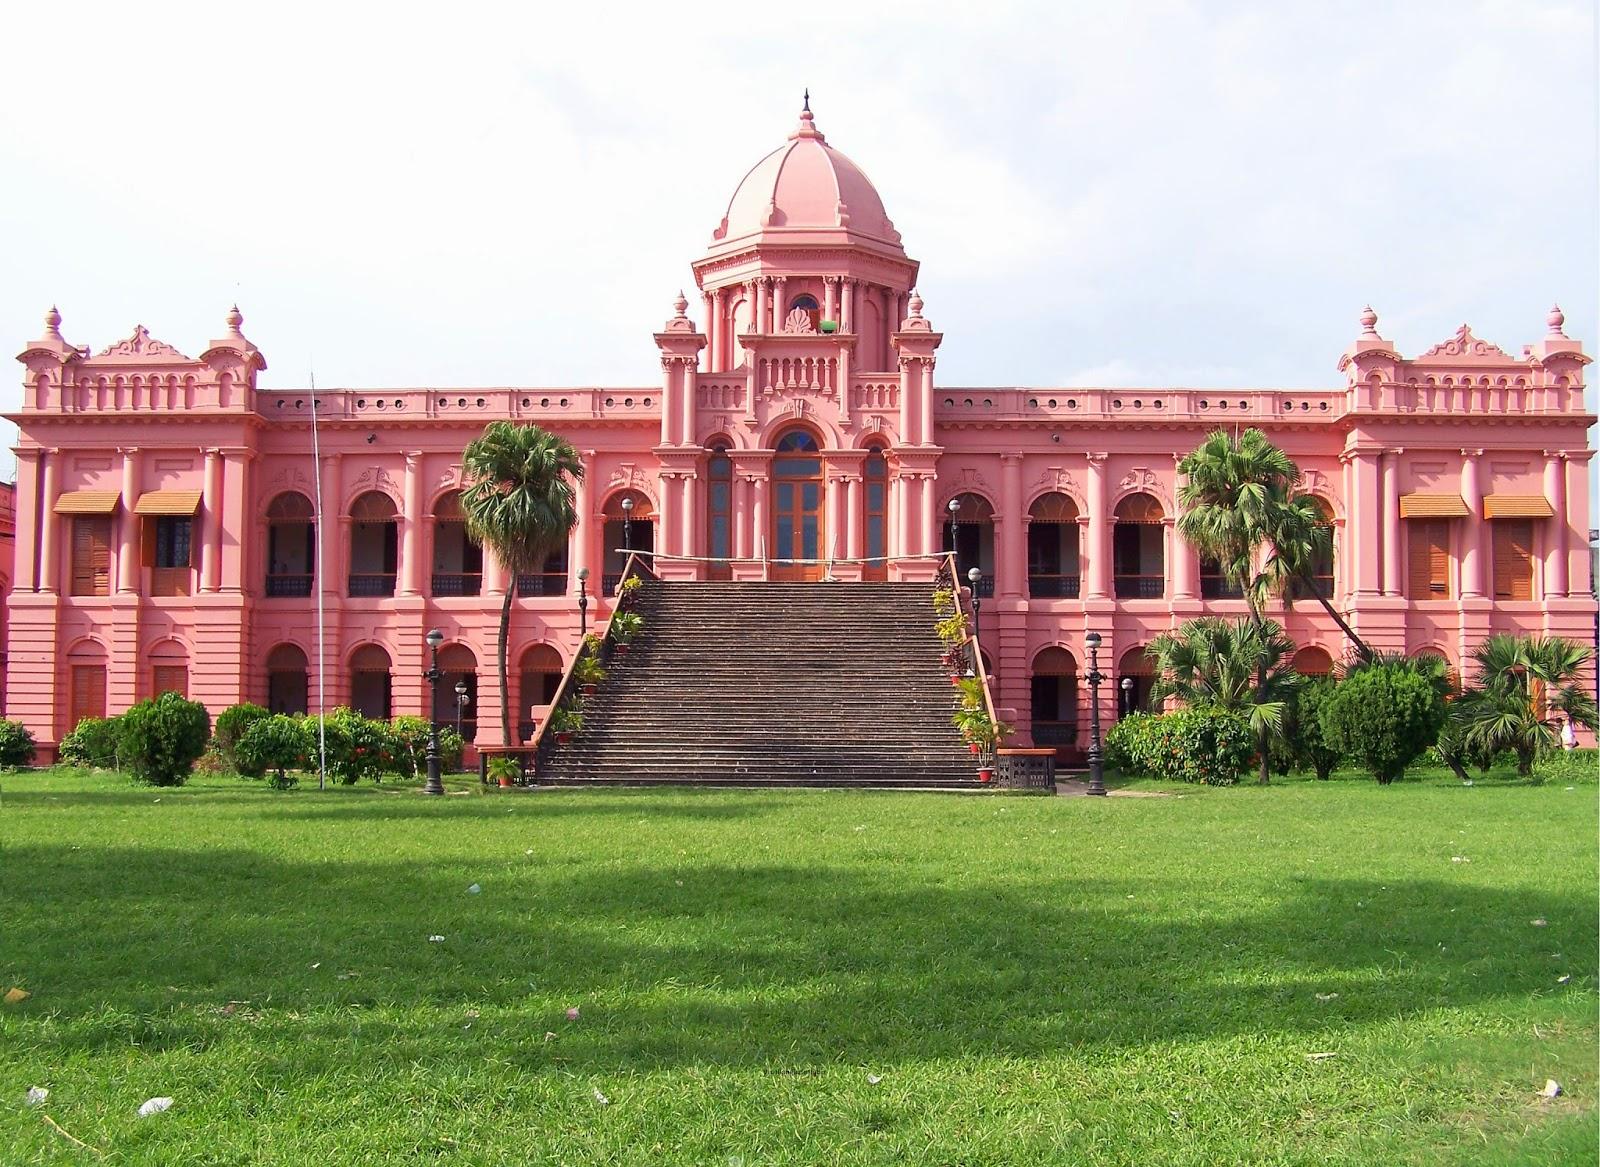 Ahsan Manzil, Dhaka, Bangladesh : An Attractive Historical